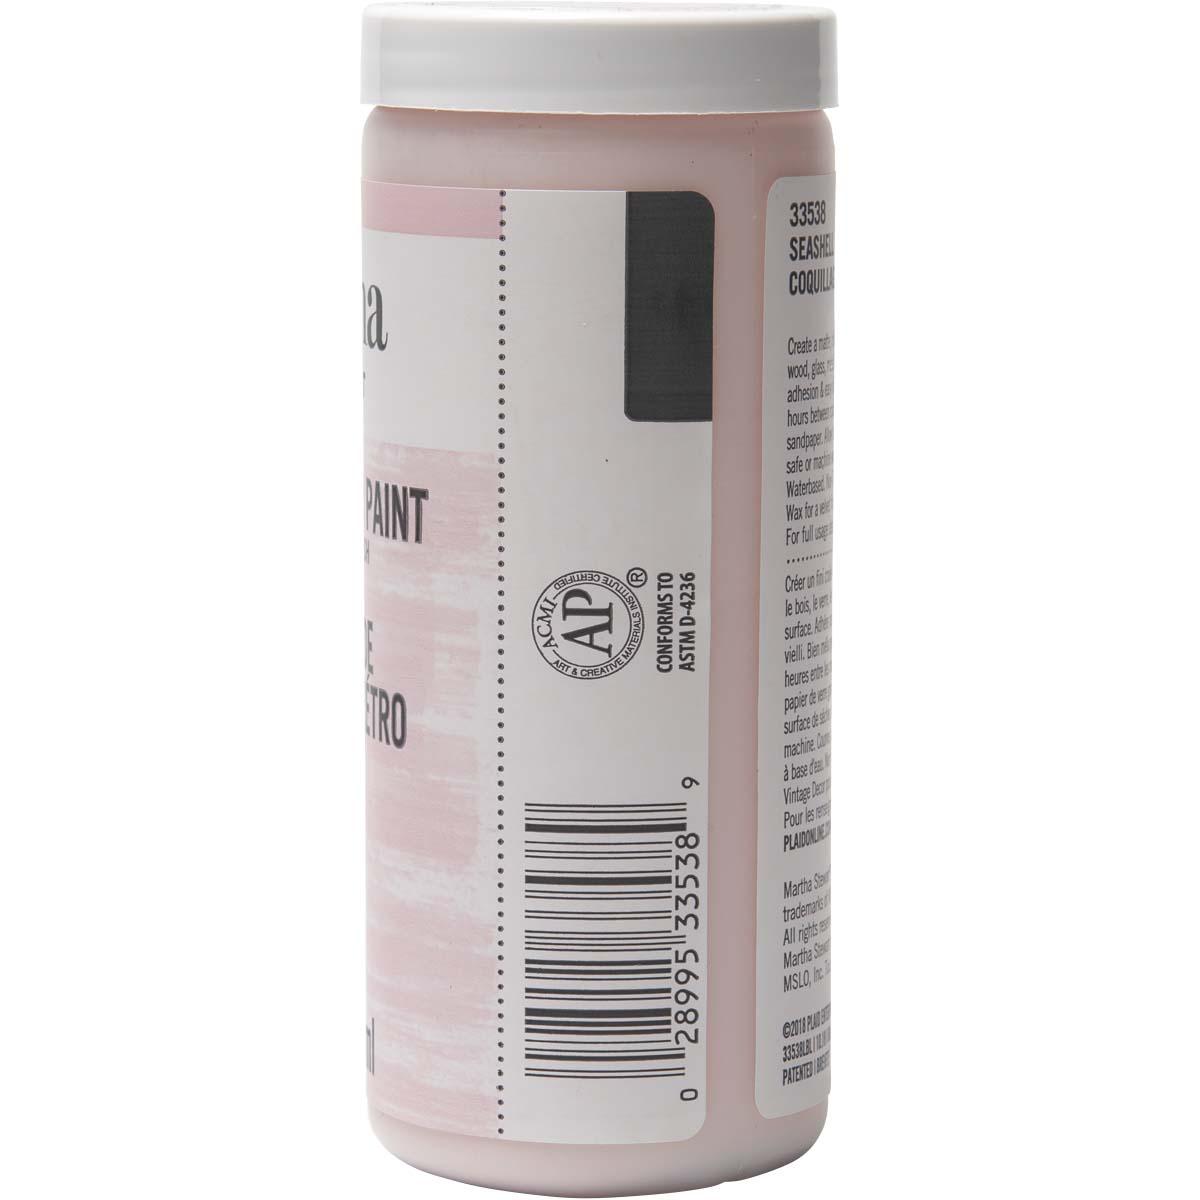 Martha Stewart ® Vintage Decor Matte Chalk Acrylic Paint - Seashell, 8 oz. - 33538